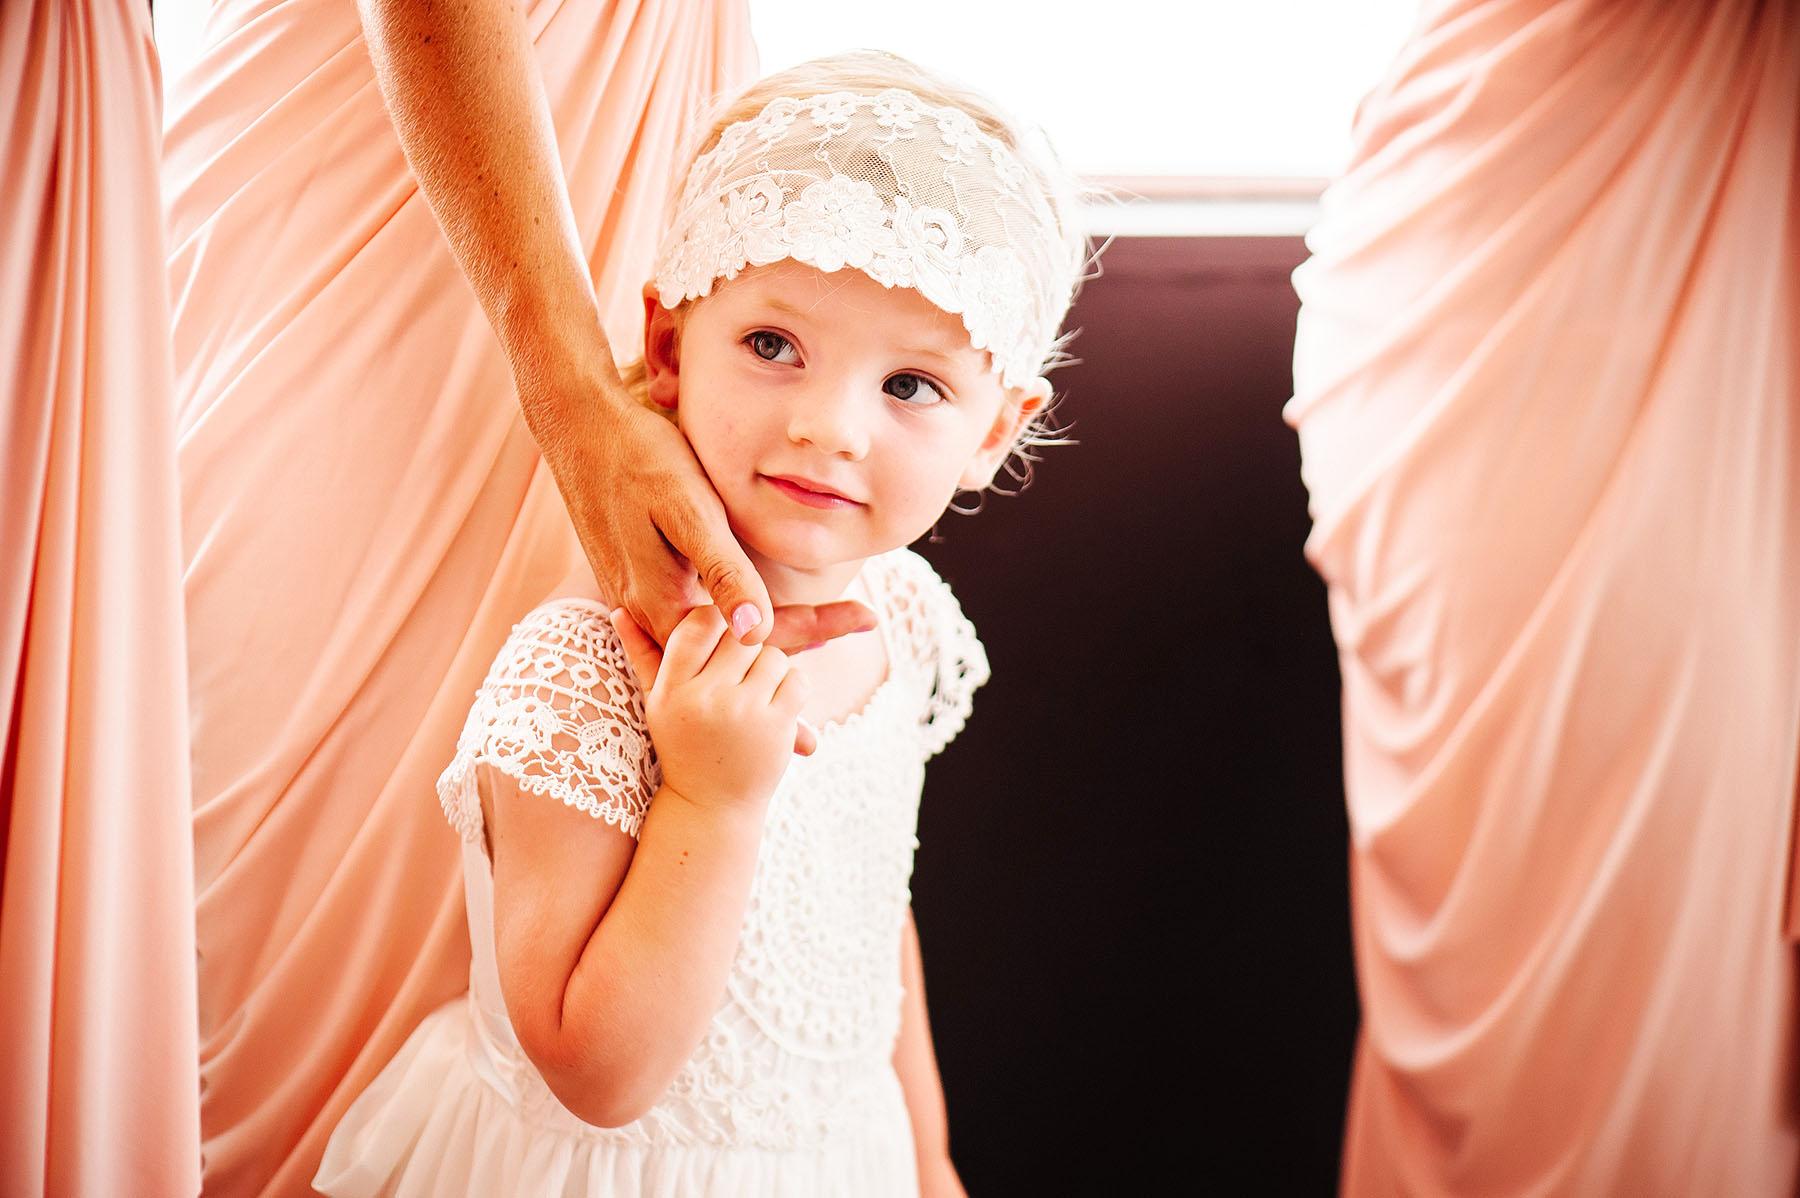 Marryme_wedding_photography_dorrigo_bellingen_photographer_33.jpg